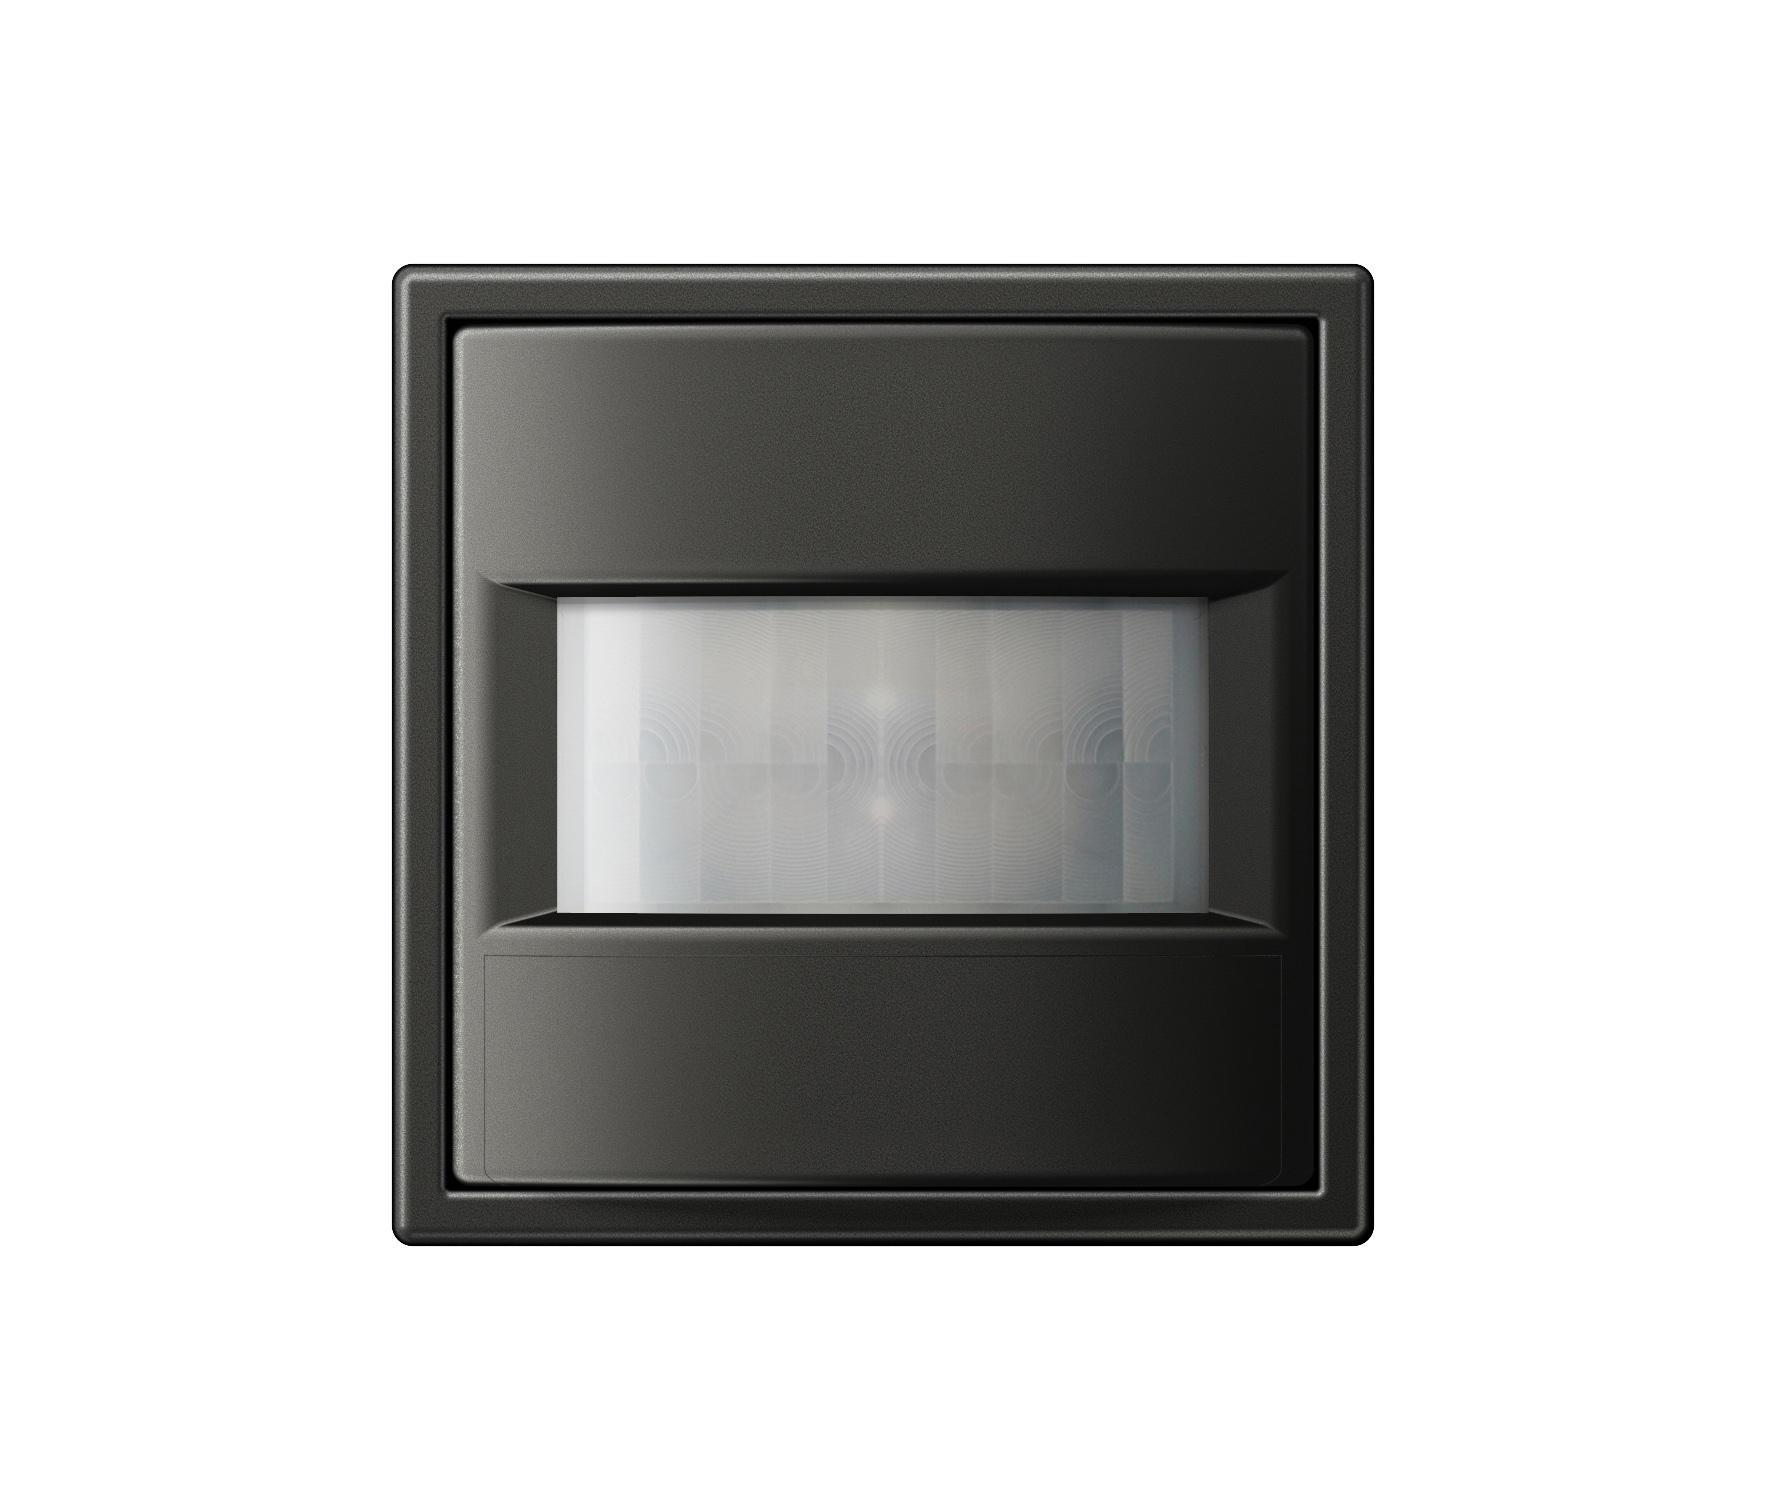 ls 990 anthrazit automatik schalter automatikschalter von jung architonic. Black Bedroom Furniture Sets. Home Design Ideas